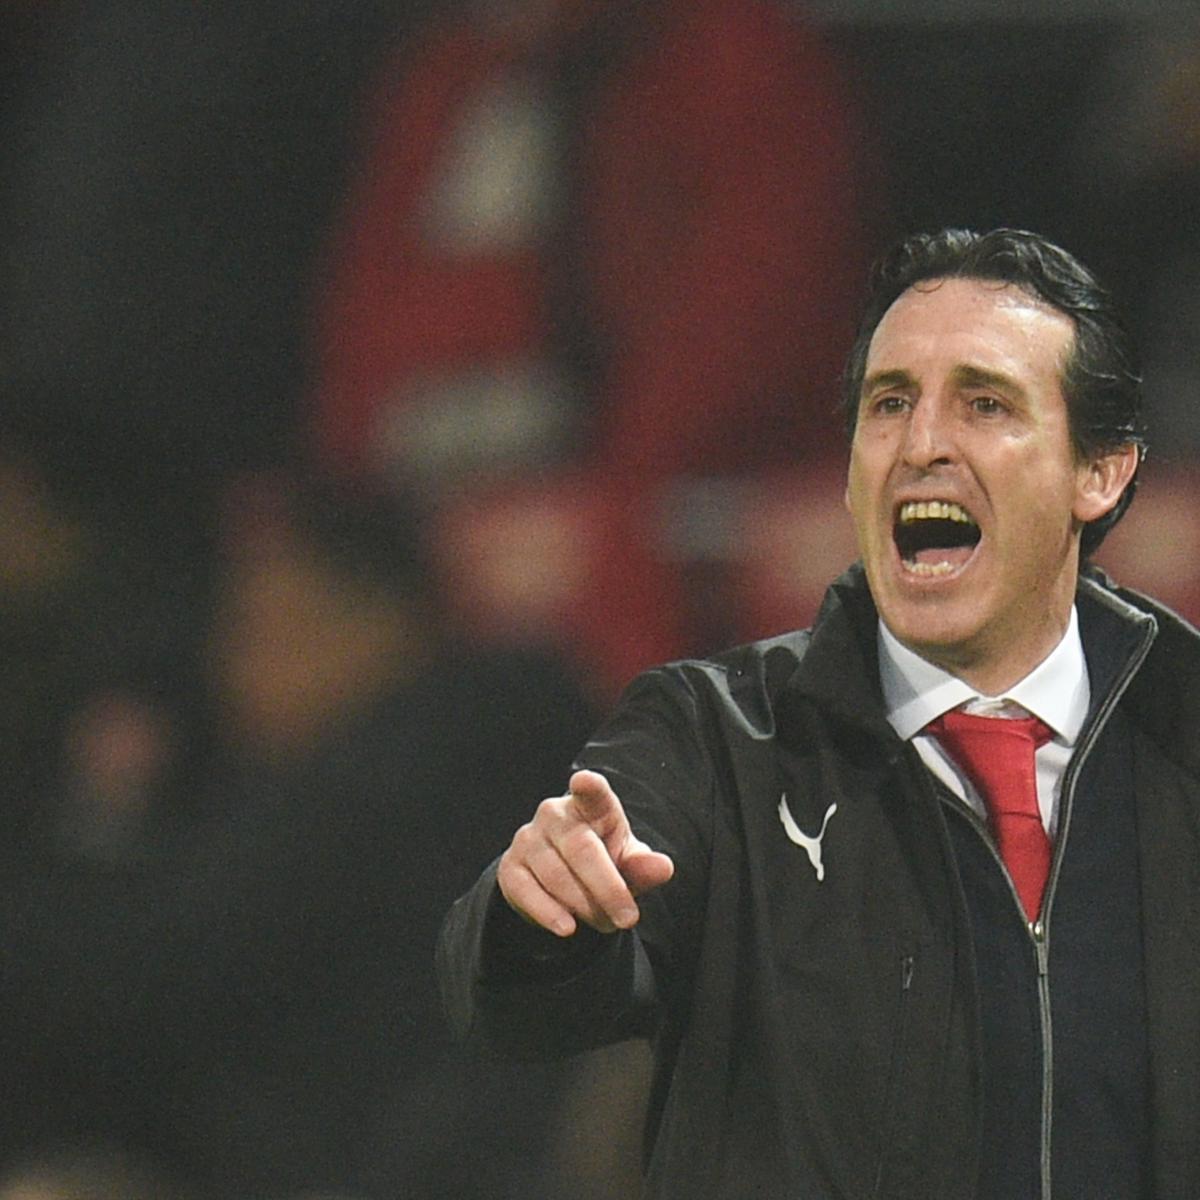 Unai Emery Says David Silva Played a Part in His Move to Arsenal